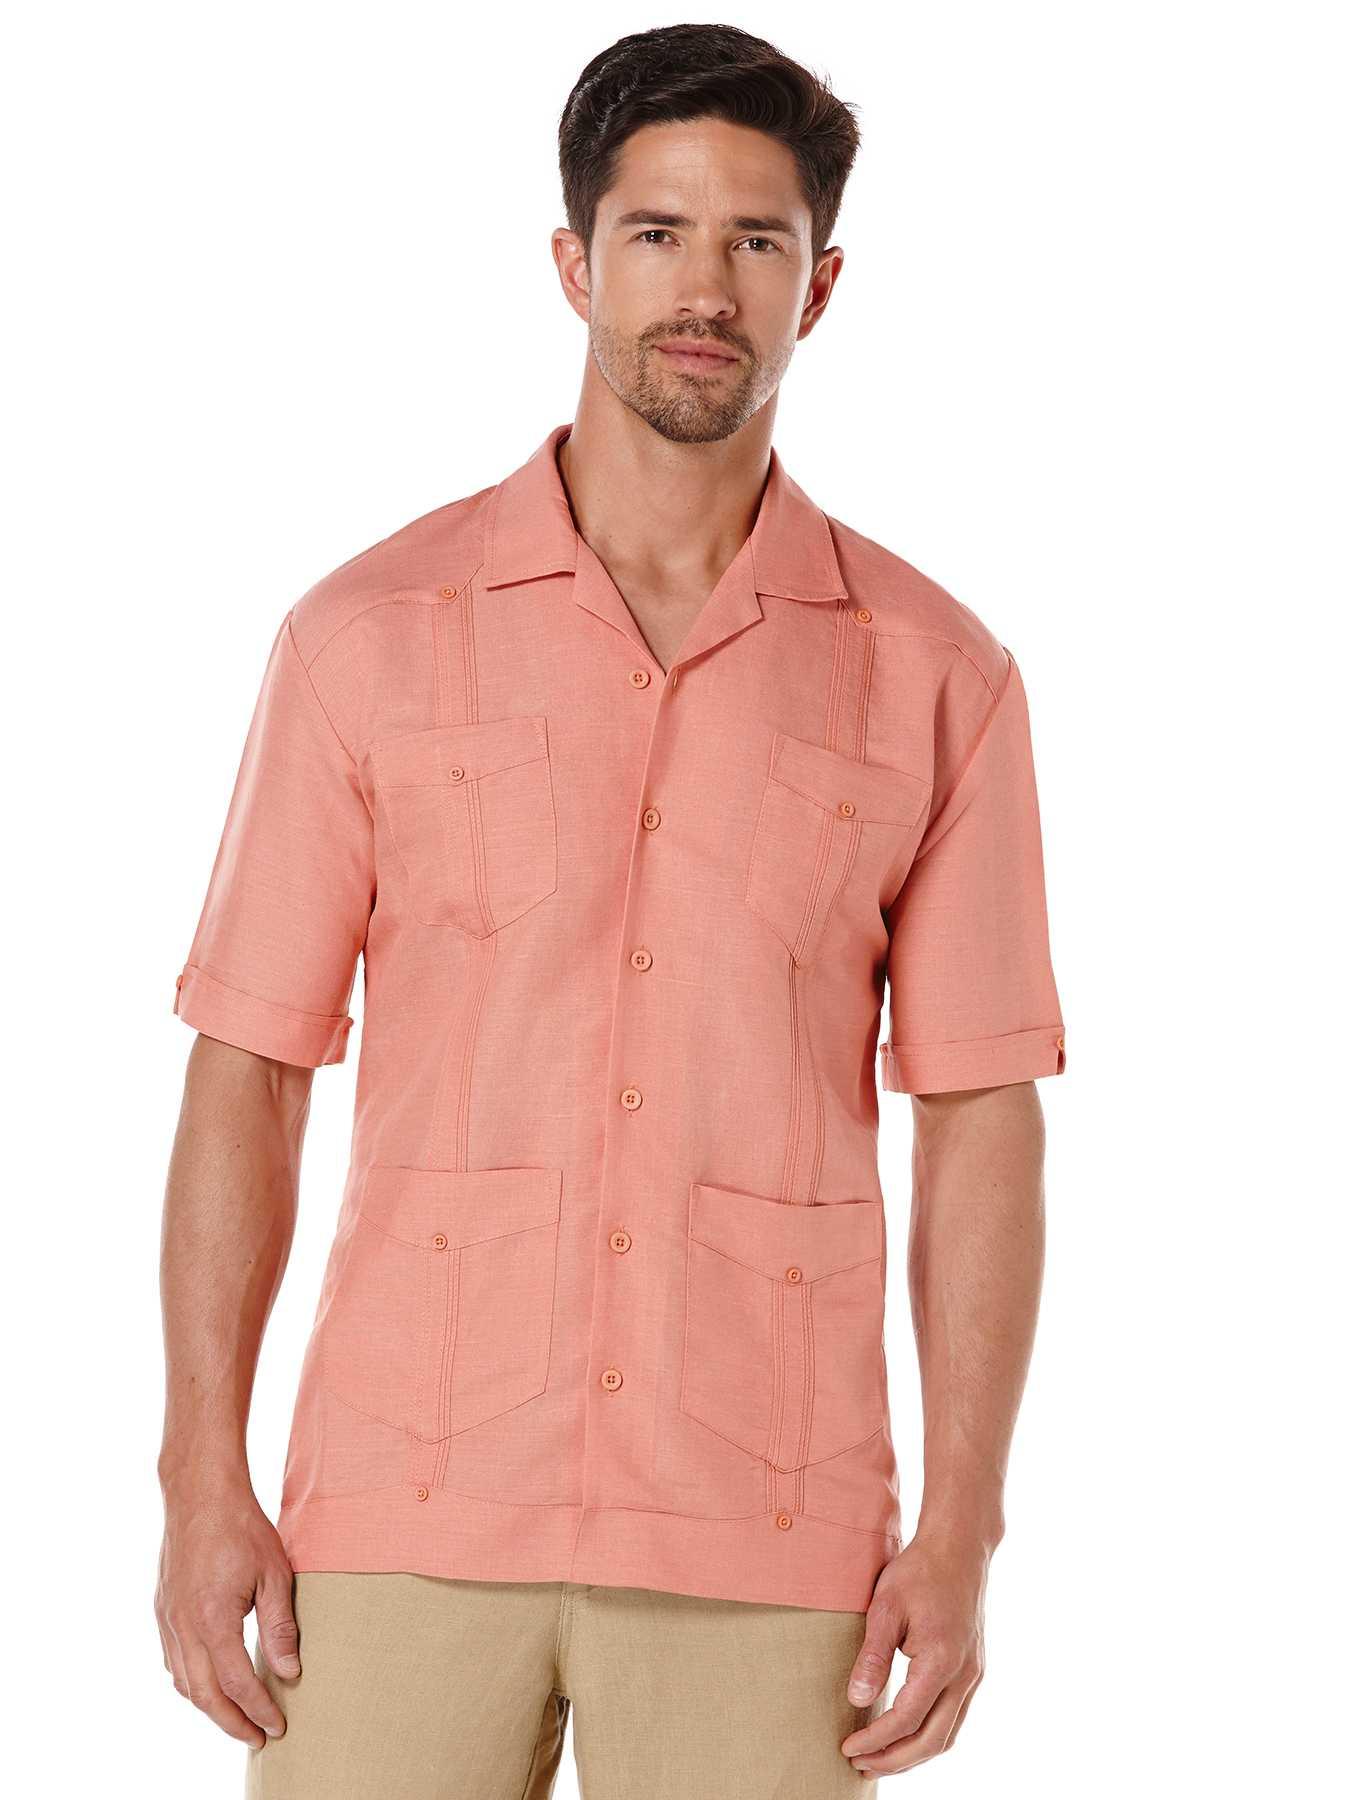 Cubavera Rayon Blend Short Sleeve Guayabera Shirt